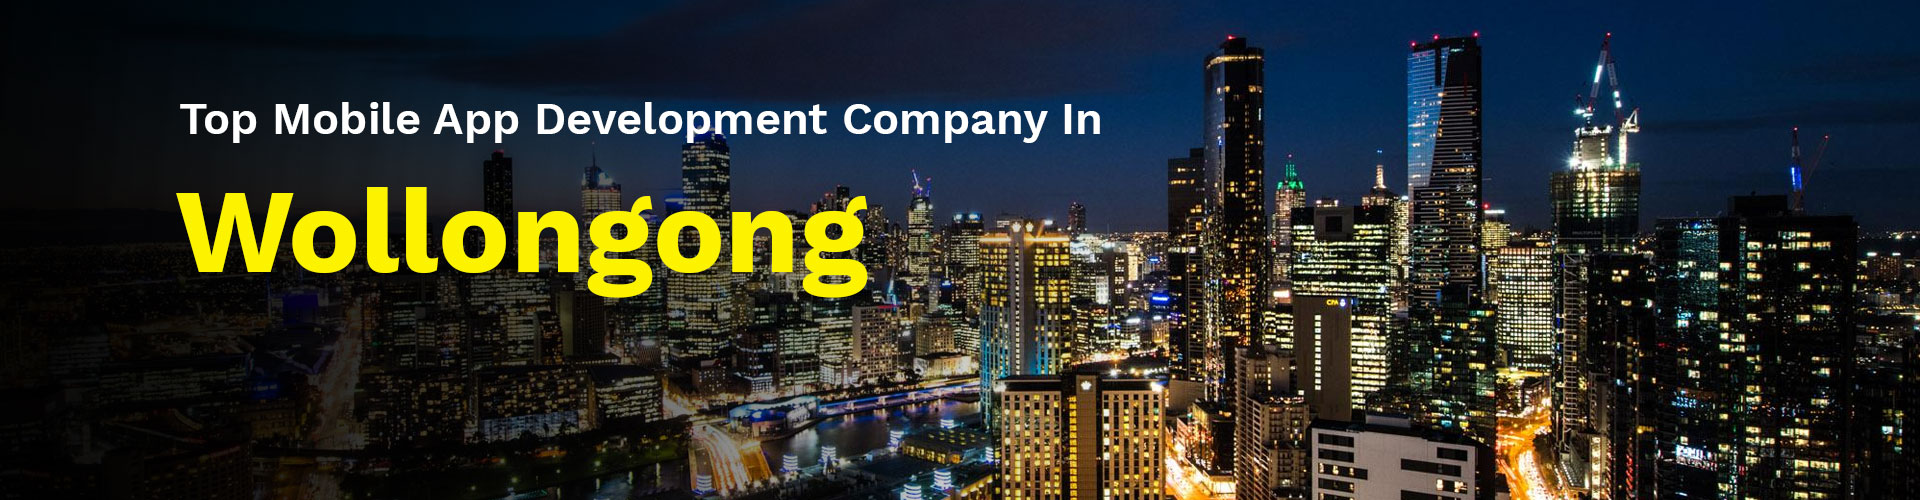 mobile app development company wollongong